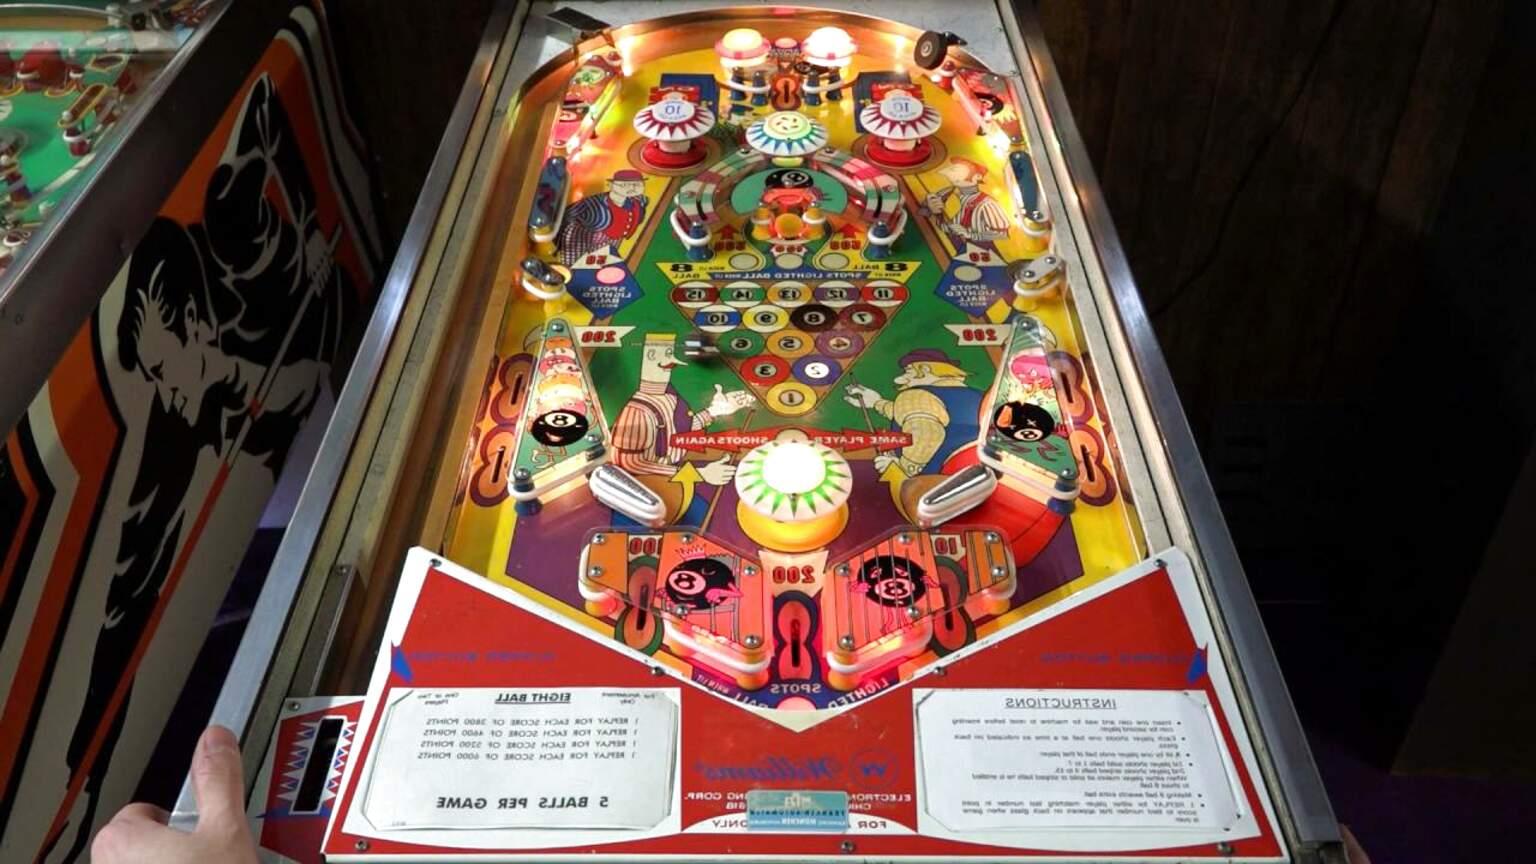 8 ball pinball machine for sale